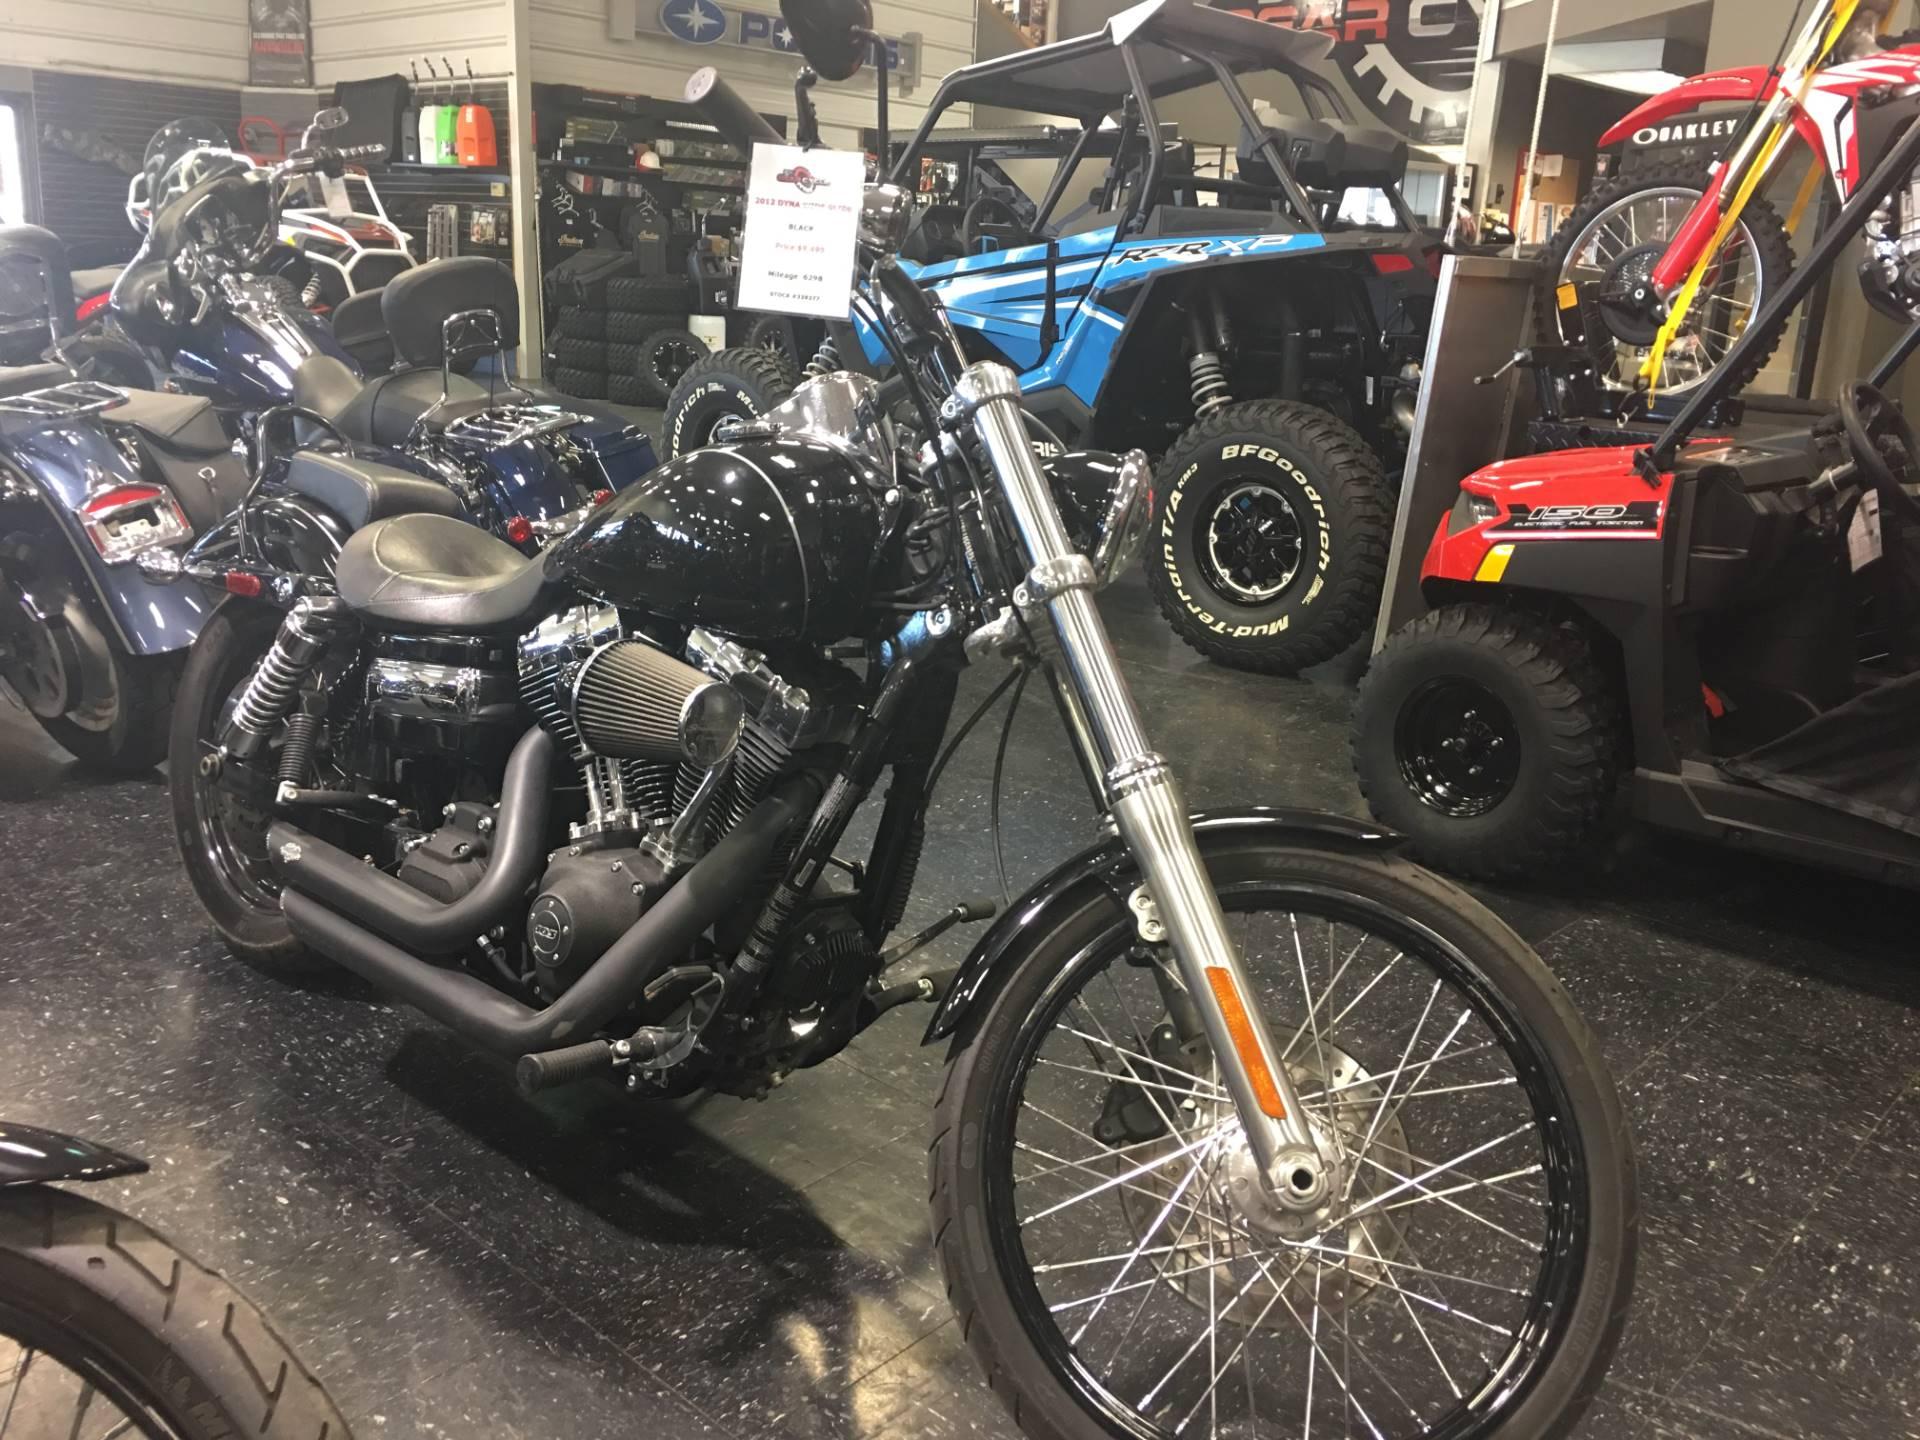 2012 Harley-Davidson Dyna Wide Glide 1